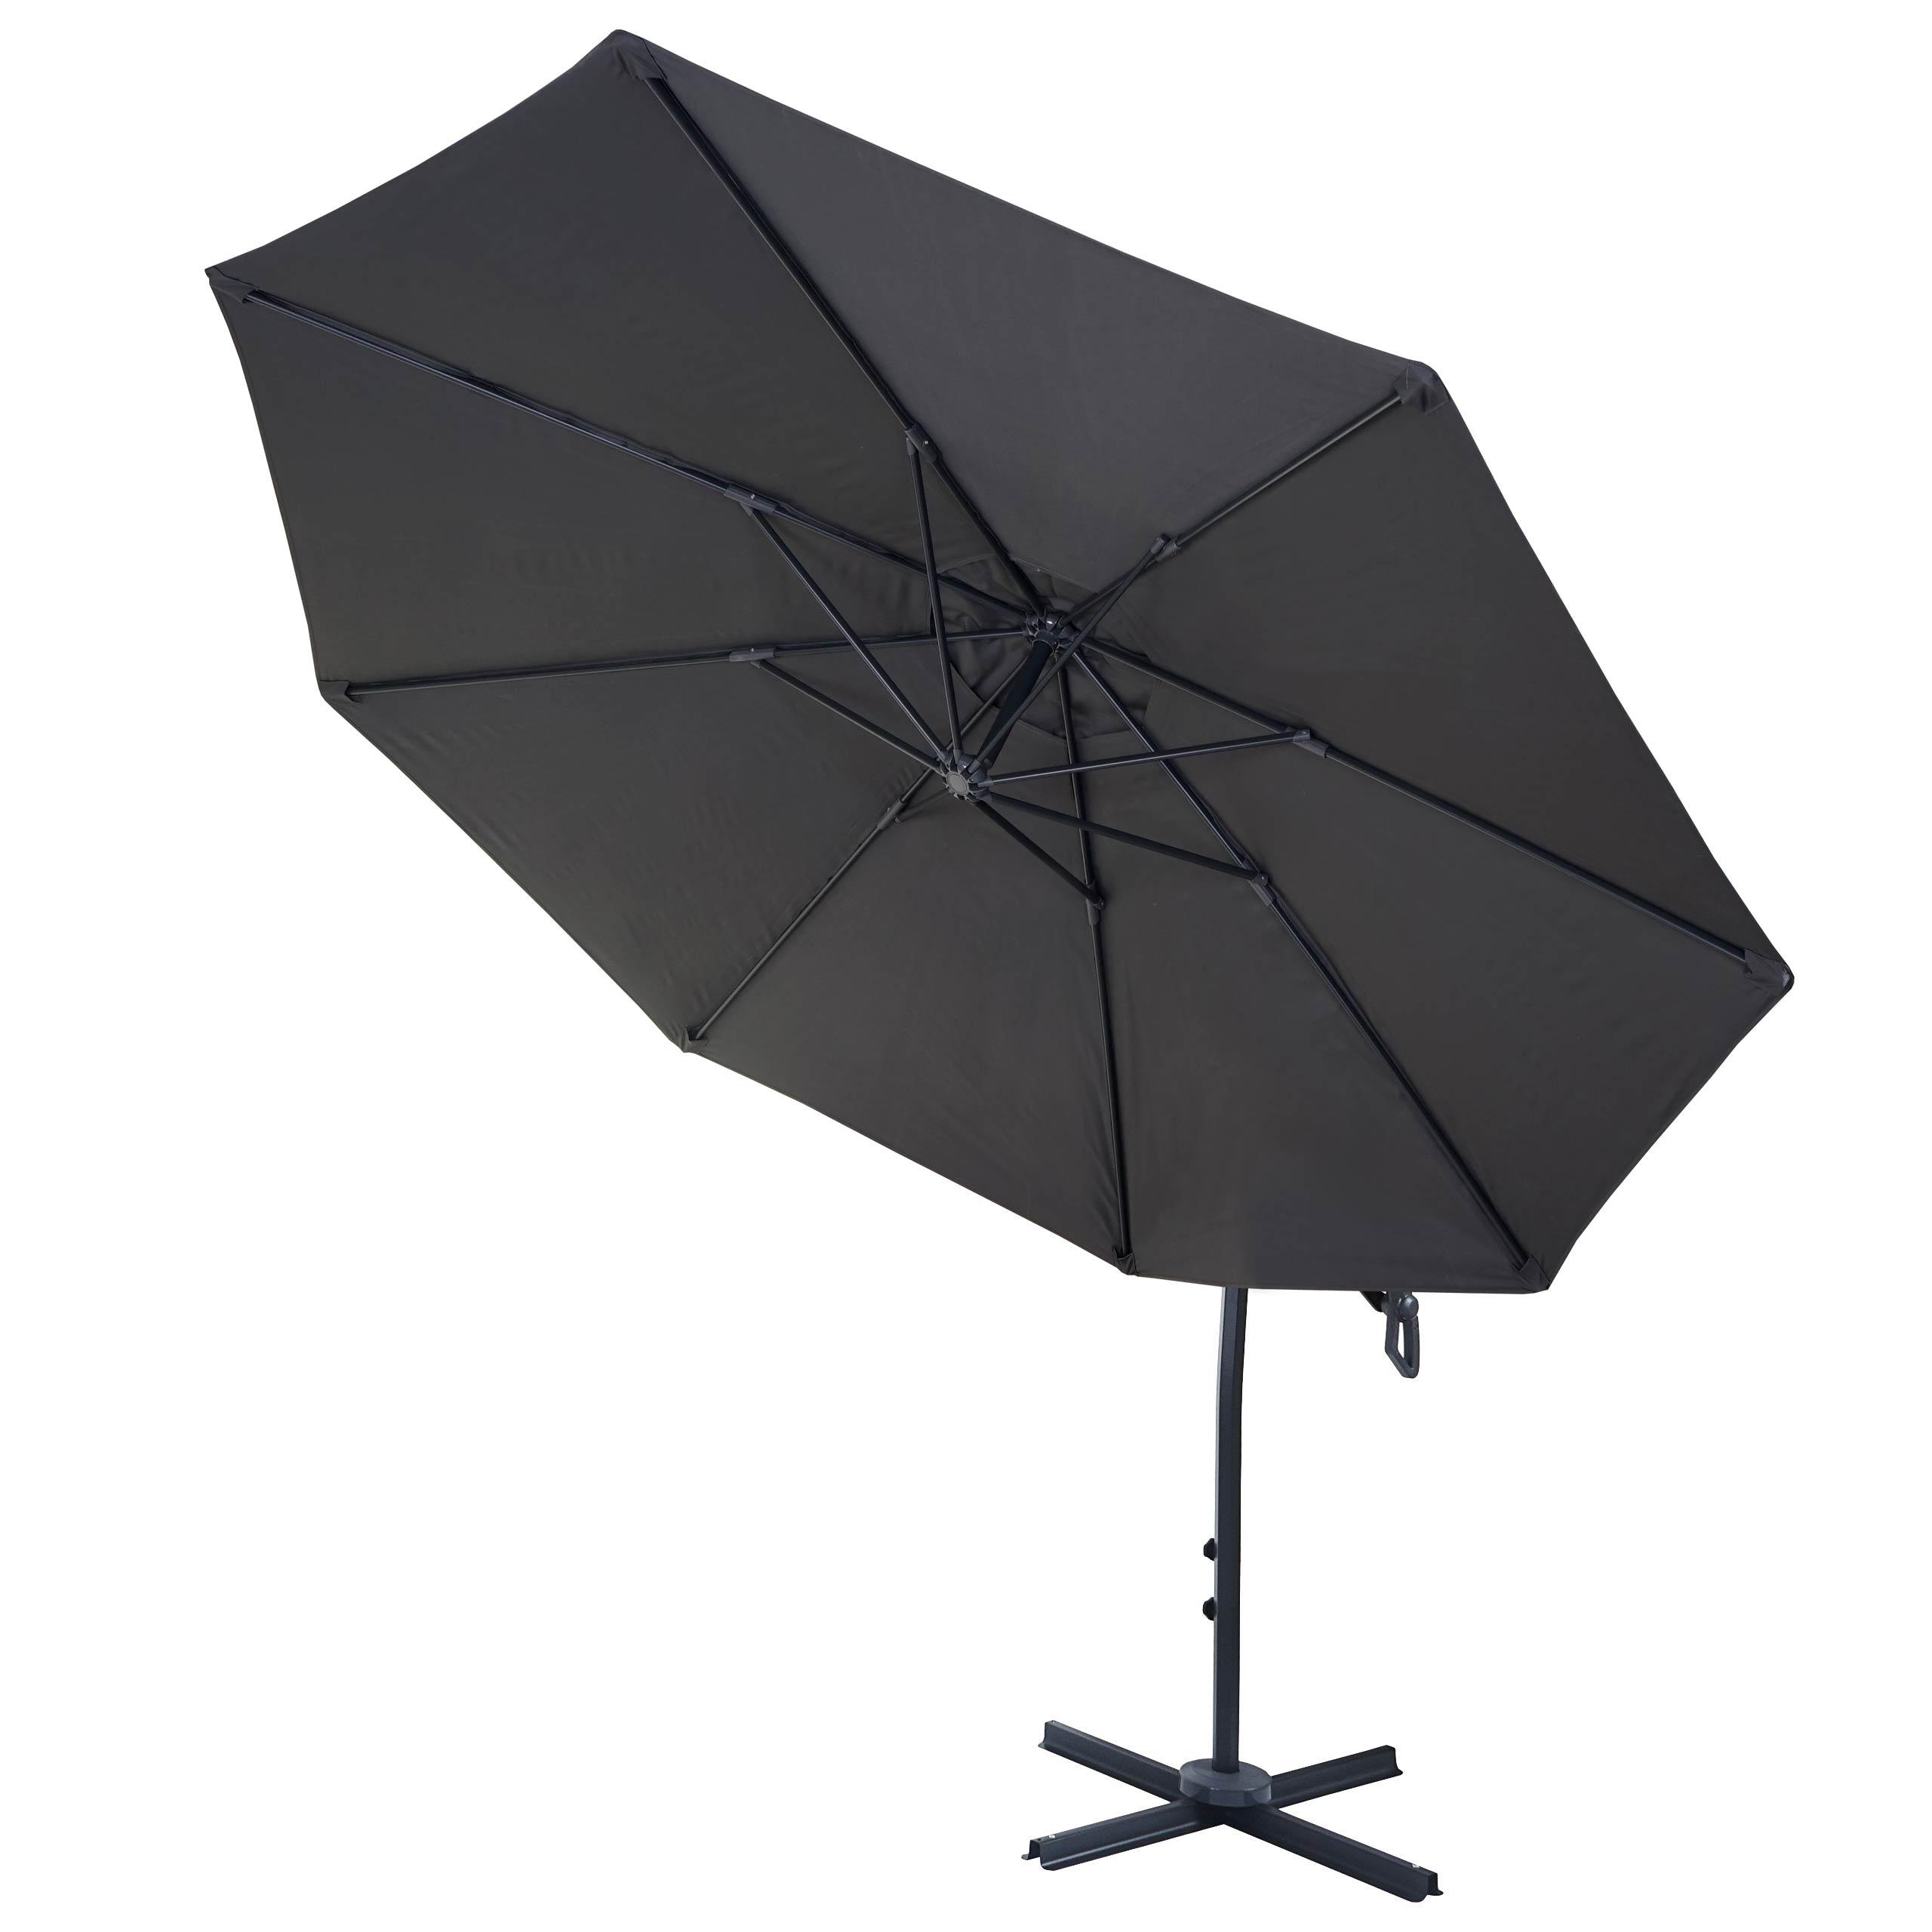 deluxe ampelschirm mcw d14 sonnenschirm rund 3m polyester alu stahl 14kg anthrazit ohne. Black Bedroom Furniture Sets. Home Design Ideas